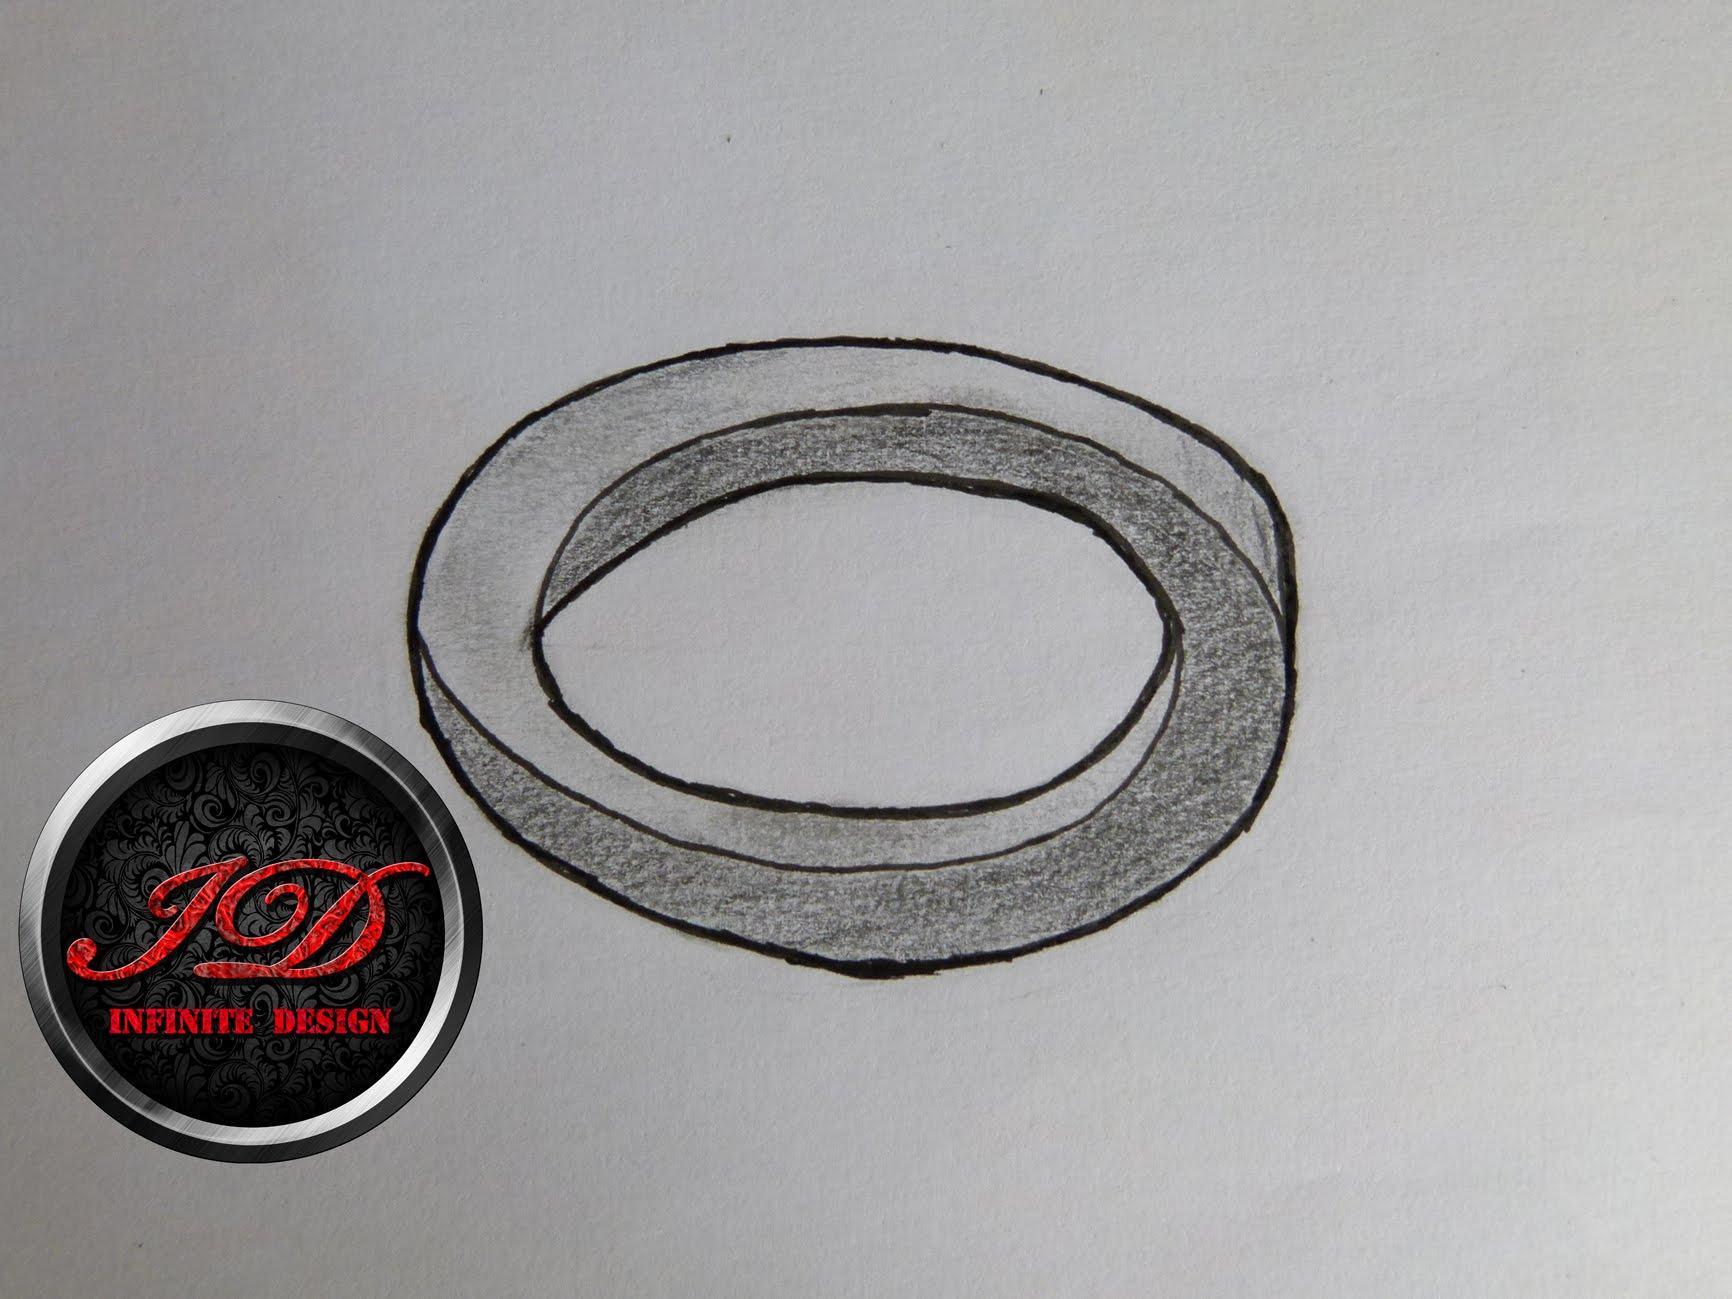 Drawn optical illusion circle Optical To an oval Draw